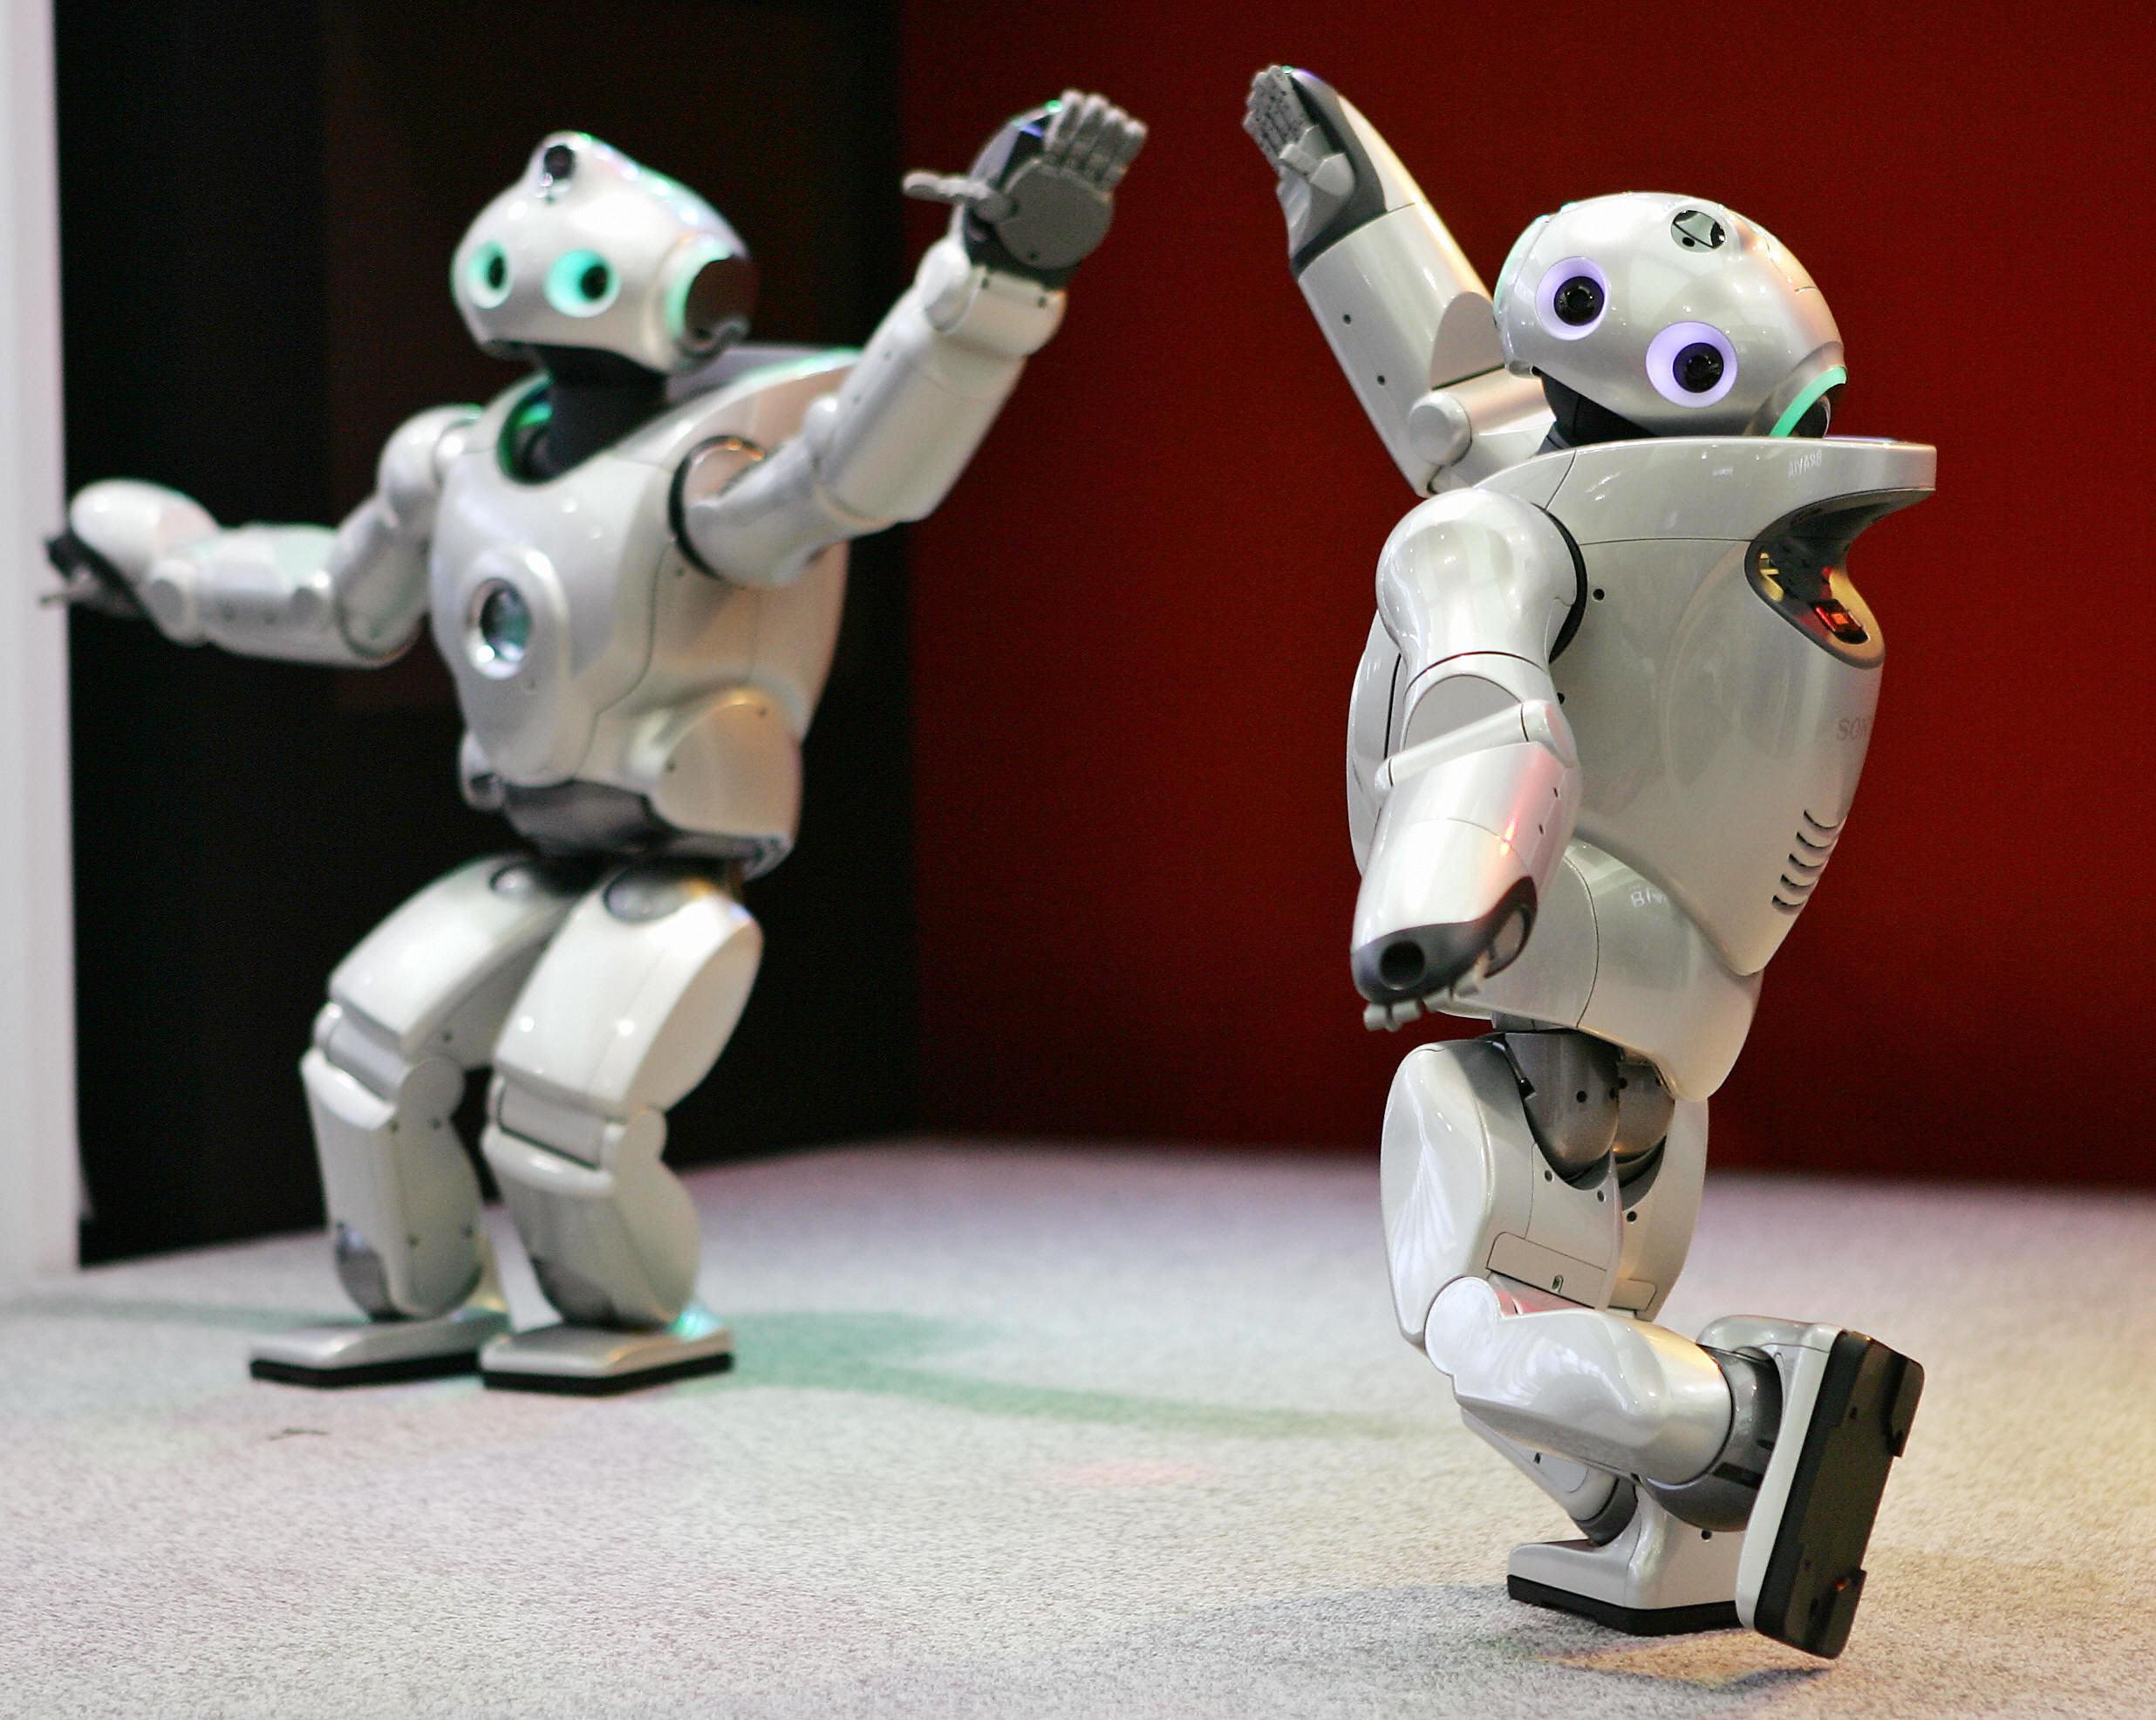 Japanese electronics giant Sony's humano